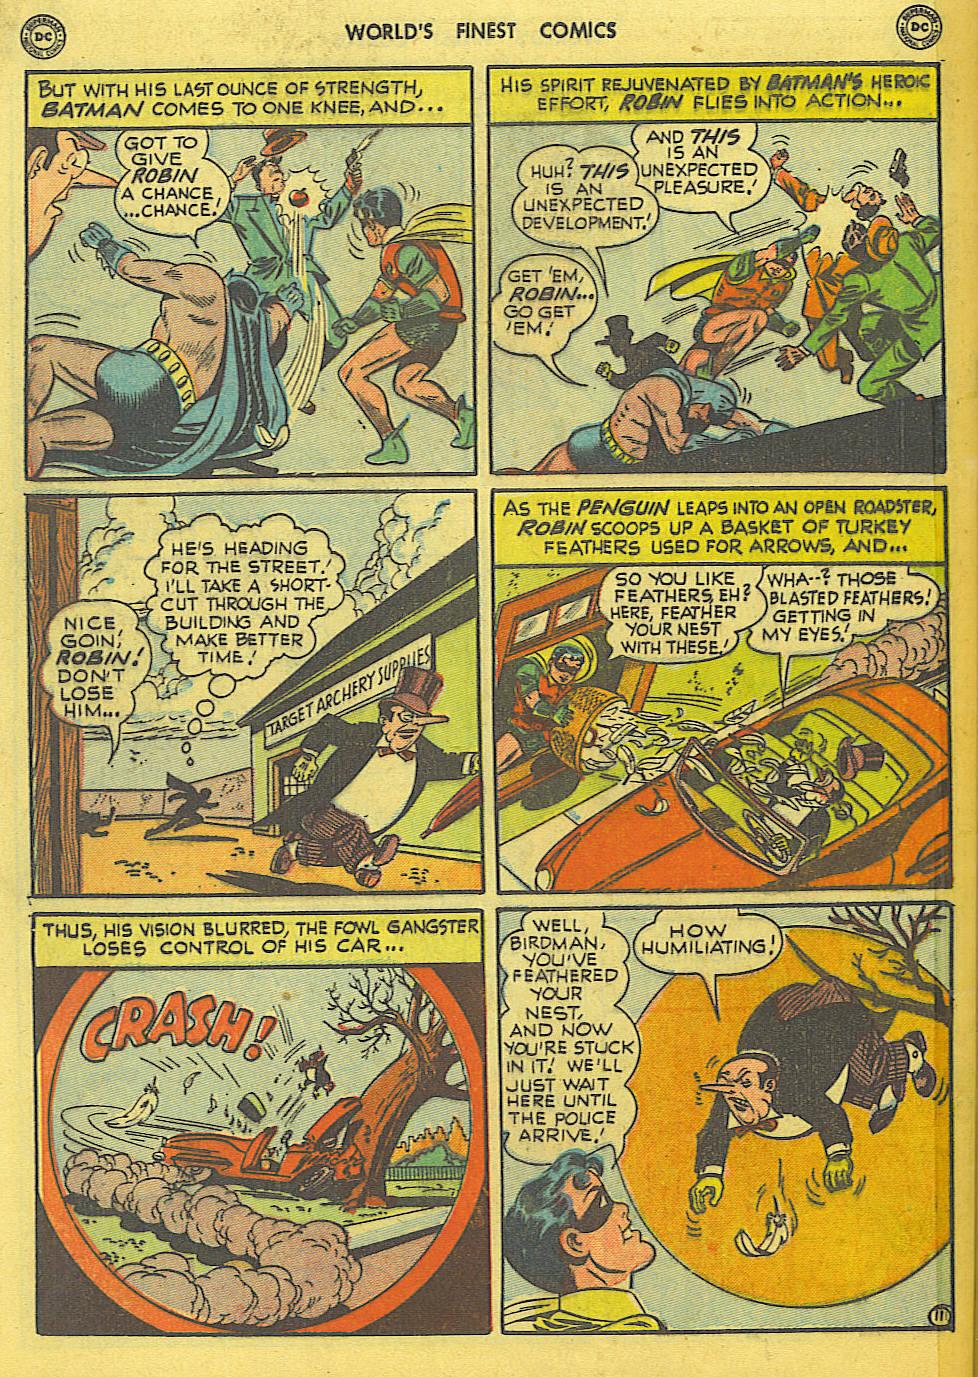 Read online World's Finest Comics comic -  Issue #49 - 73